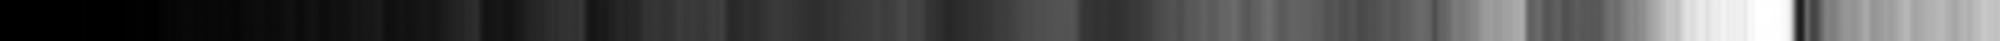 _betelgeuse_20191225_905_spectrum.thumb.jpg.9704cb762ef2f451248d006f742562ee.jpg